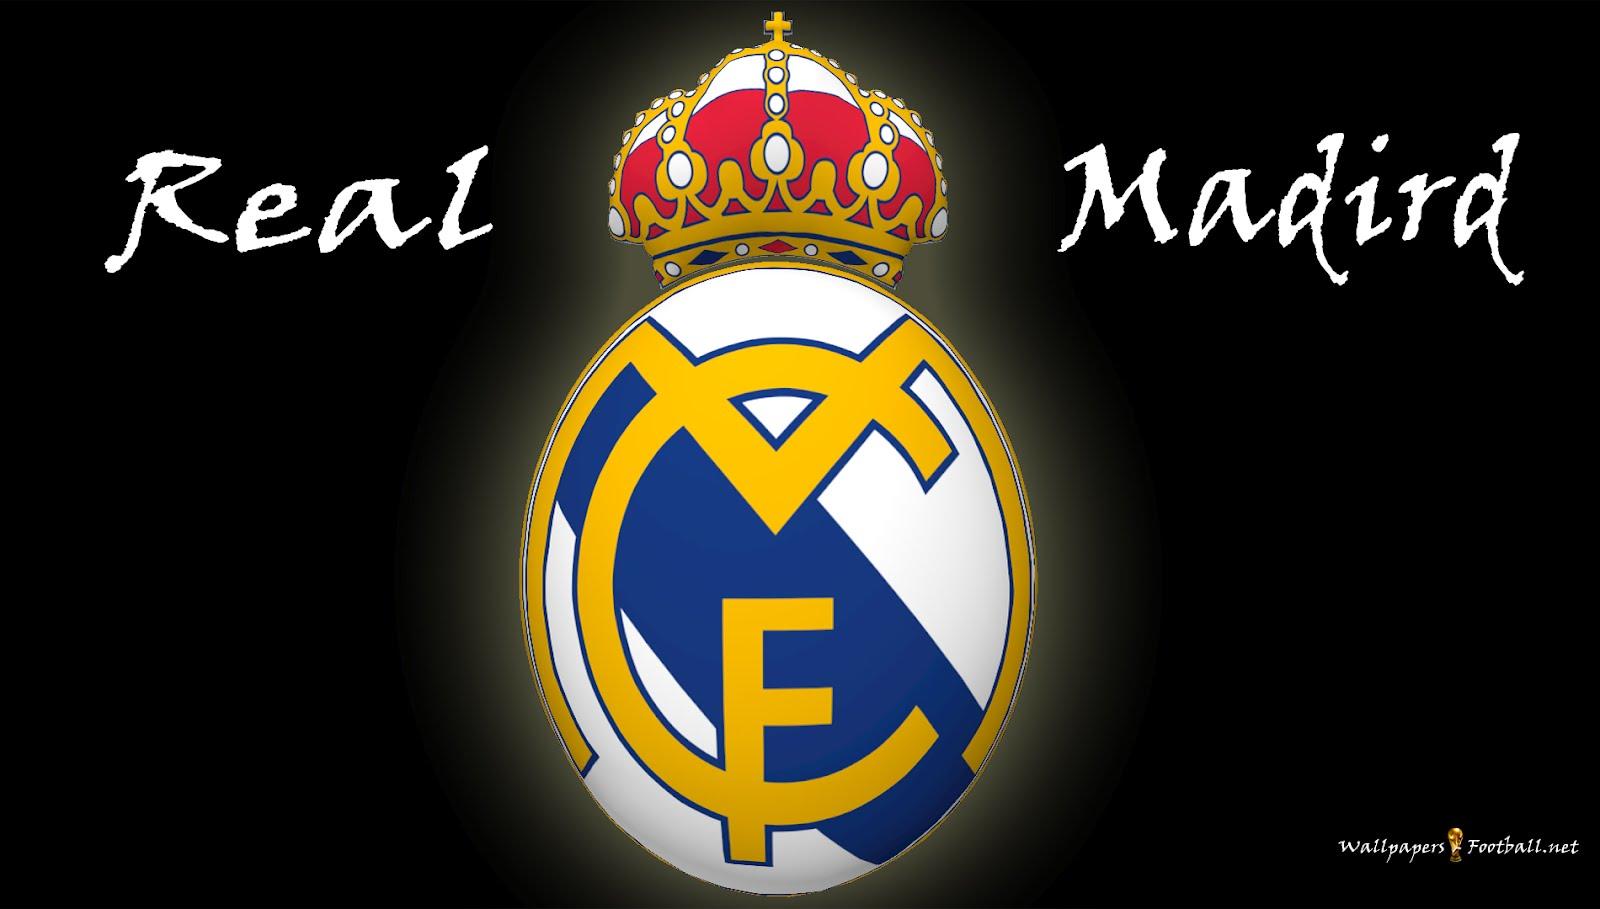 Ronaldo Hd Wallpapers Football Sum Sum Real Madrid Wallpapers